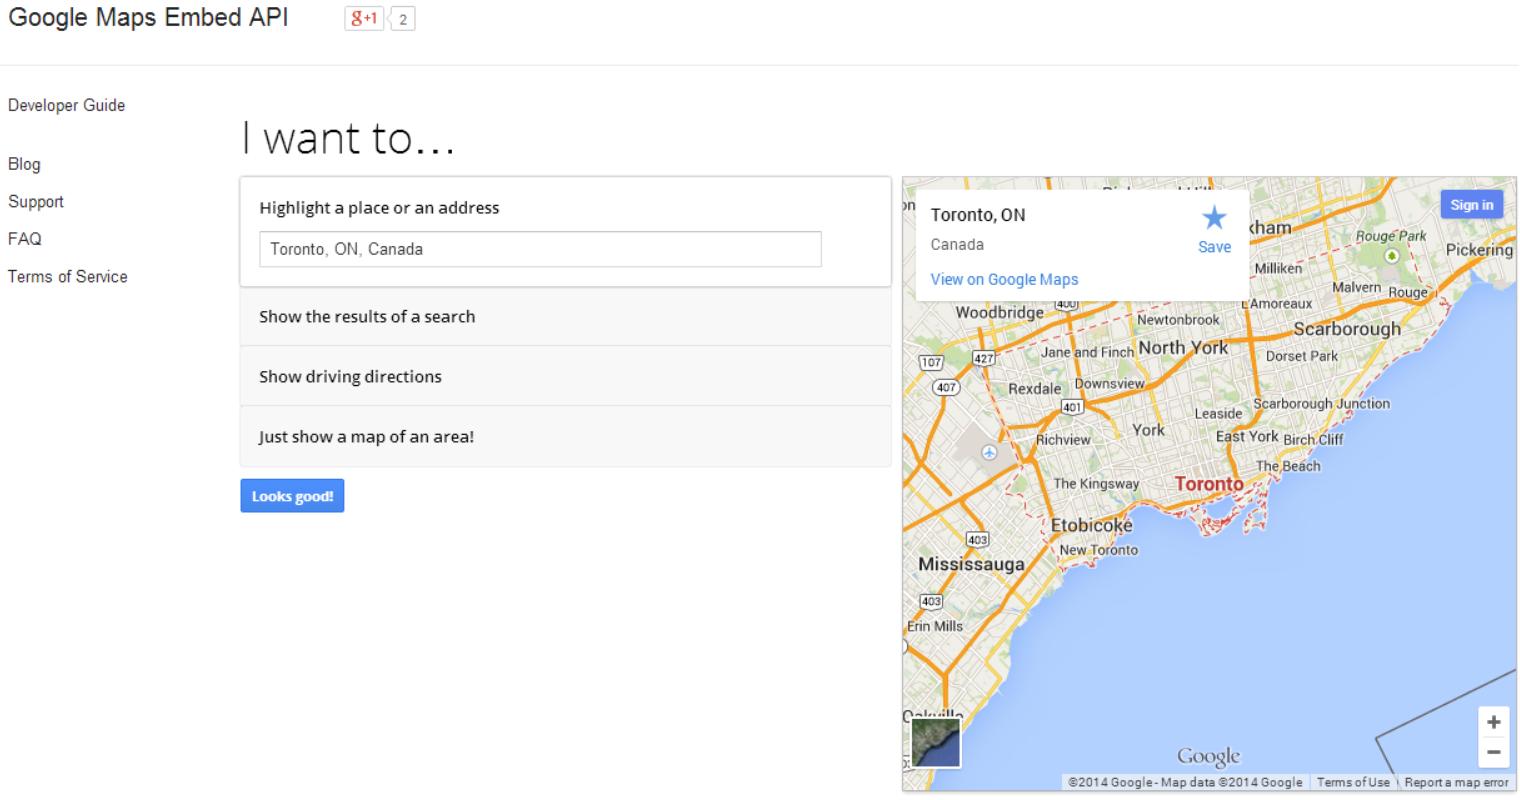 googlemapsembedapi. google maps embed api lets developers include maps in websites